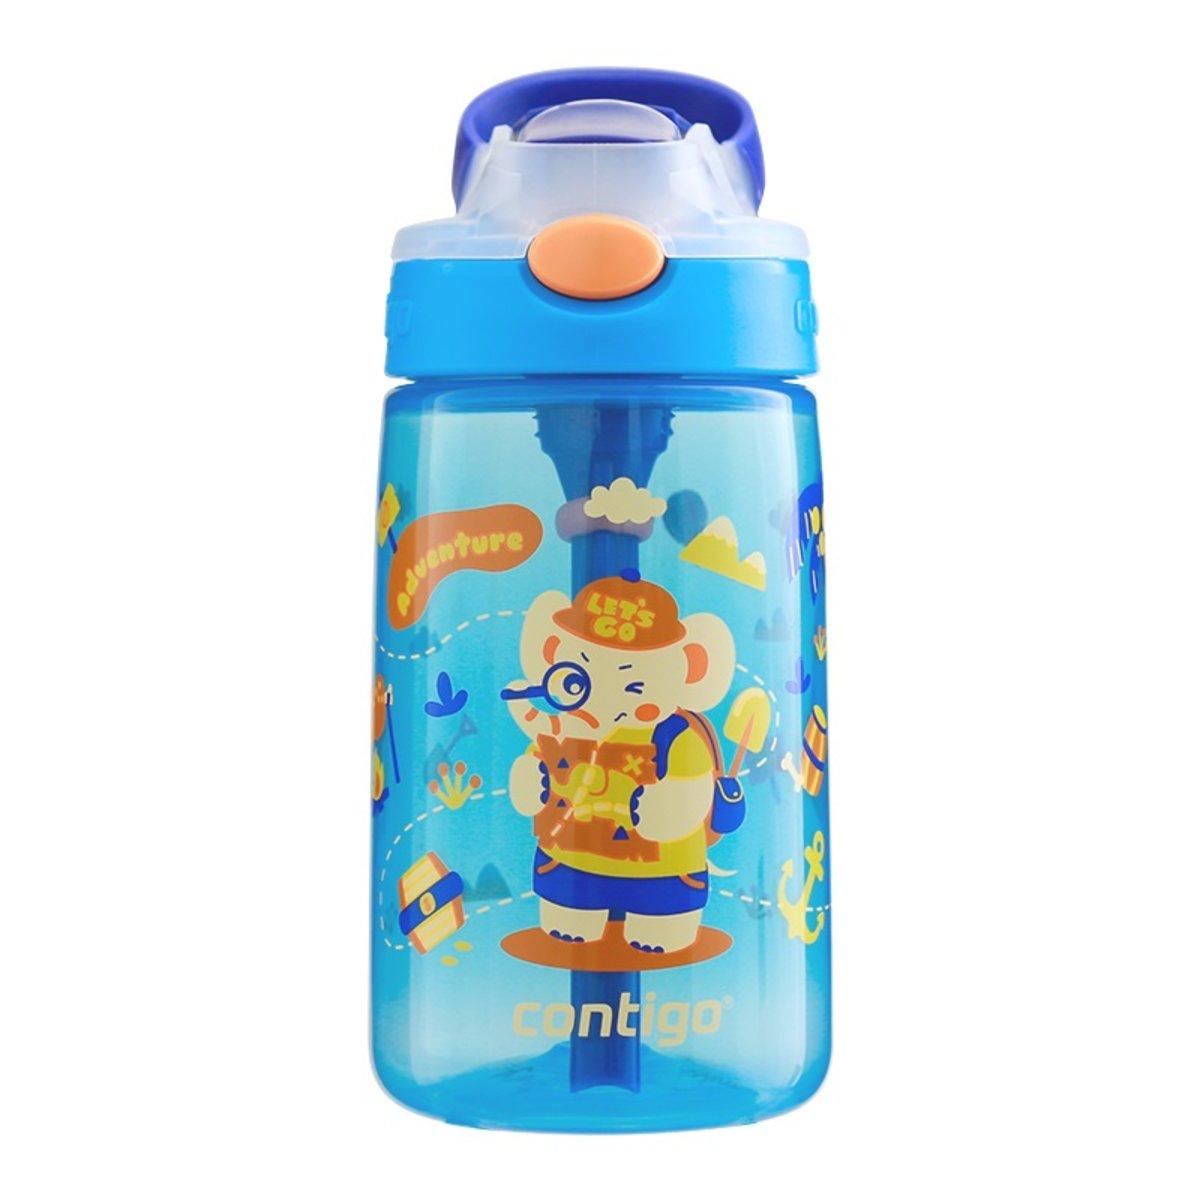 Contigo Gizmo Autospout Kids Bottle (PP) 14oz (410ml) - Treasure Hunting